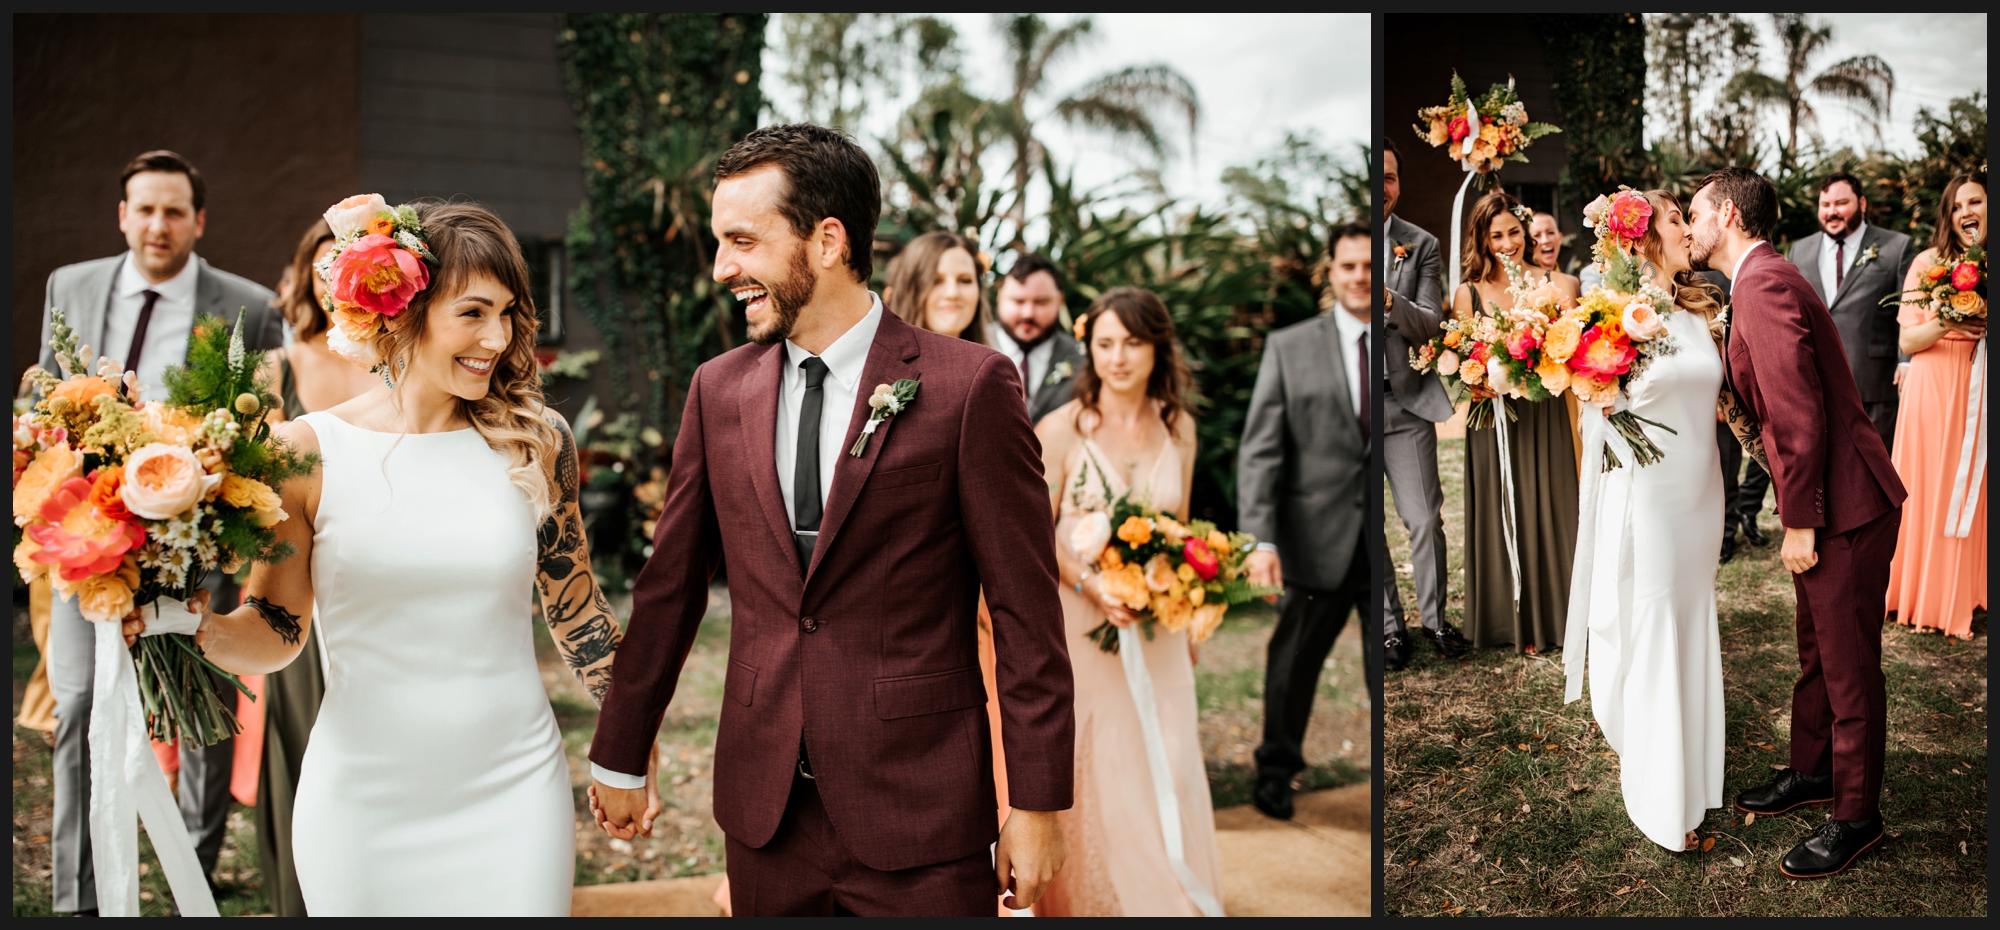 Orlando-Wedding-Photographer-destination-wedding-photographer-florida-wedding-photographer-bohemian-wedding-photographer_1944.jpg